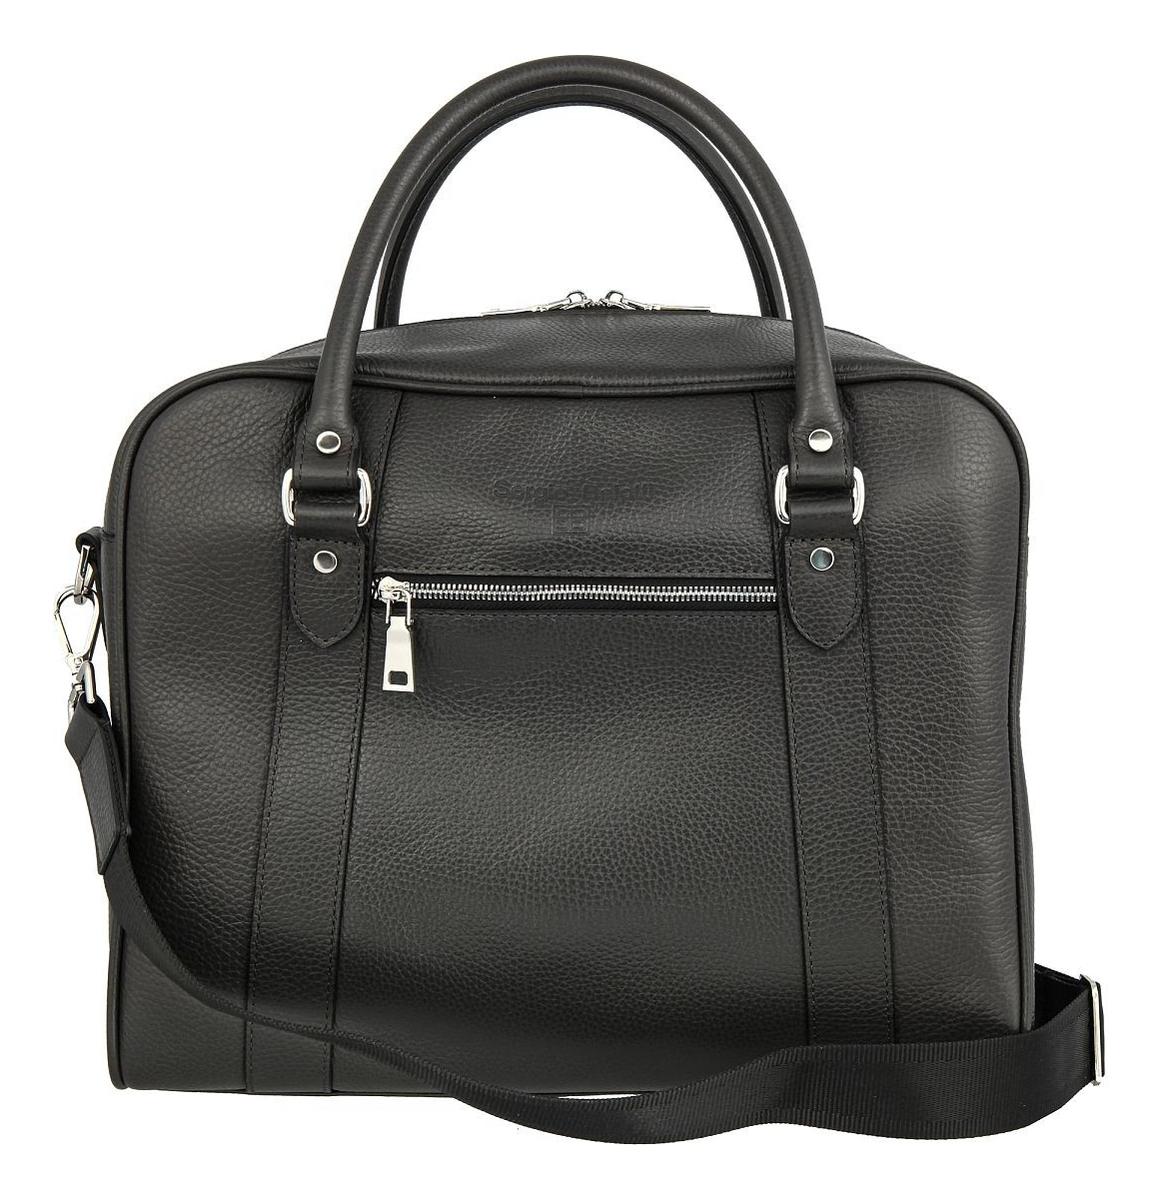 Дорожная сумка Napoli Brown 8014 дорожная сумка ardenno brown 4013 04